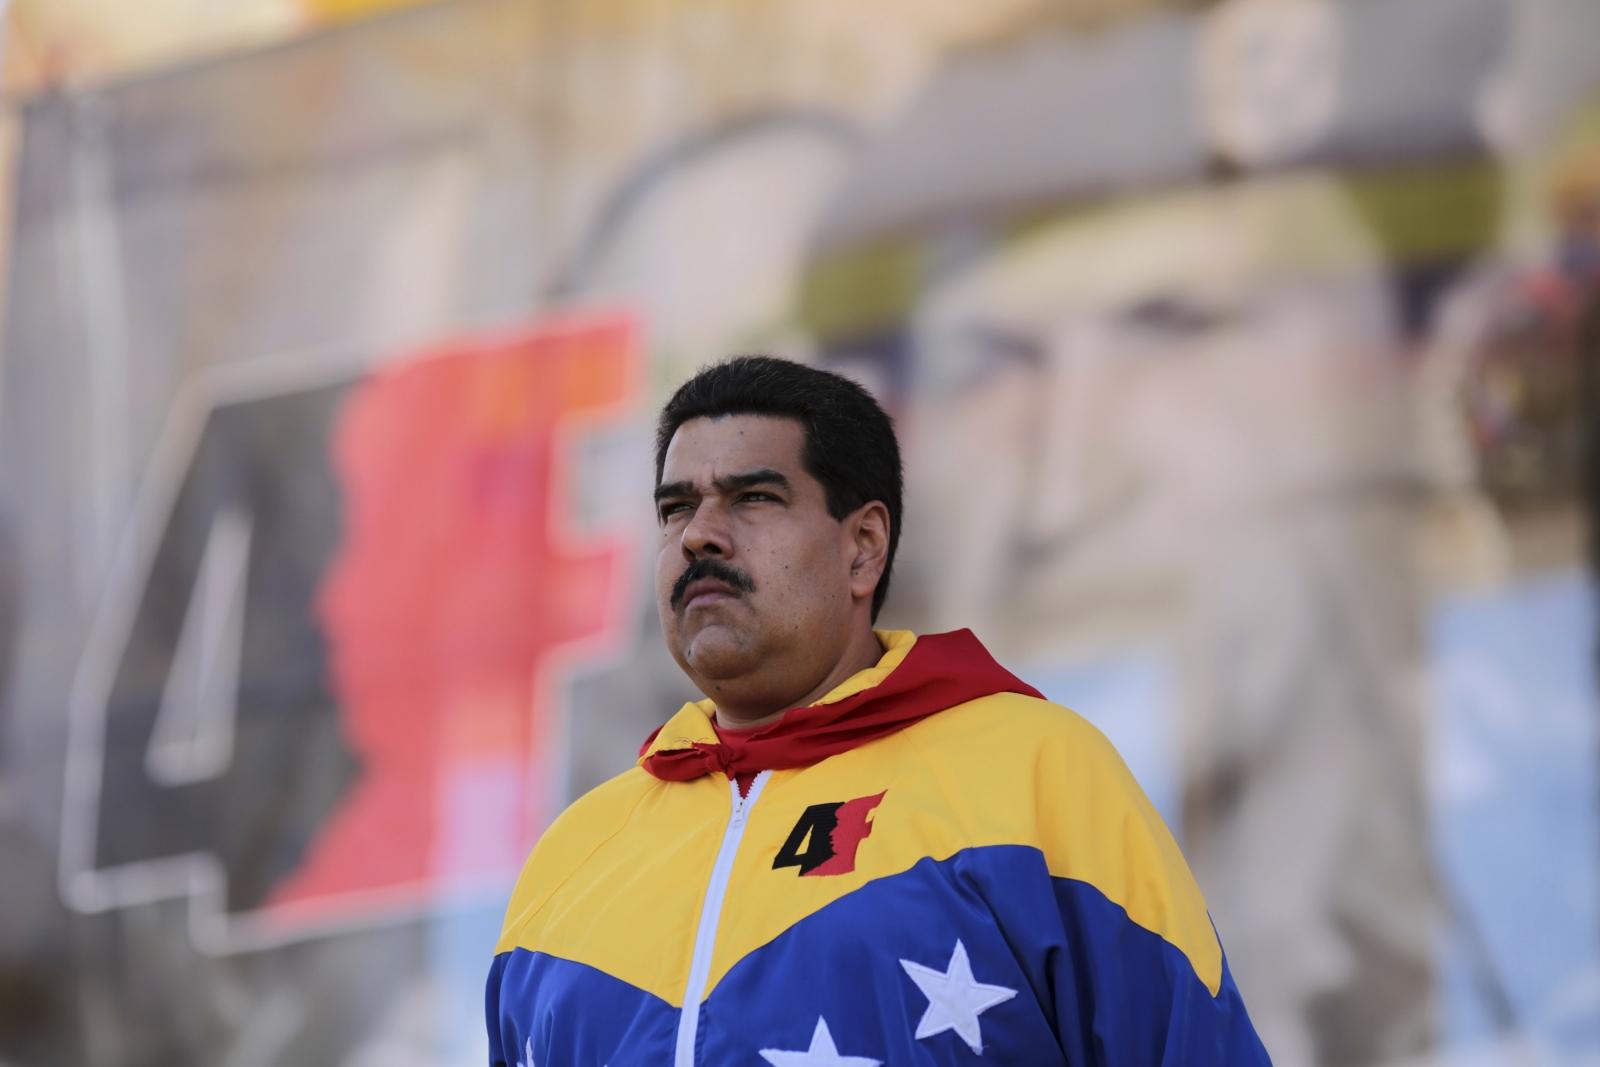 Venezuelan president Maduro alleges coup attempt by US